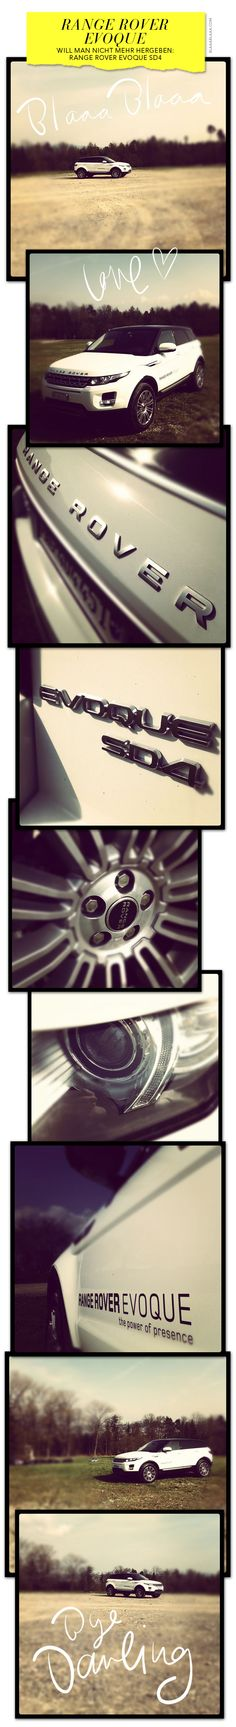 Range Rover Evoque - Very Cool Edits!